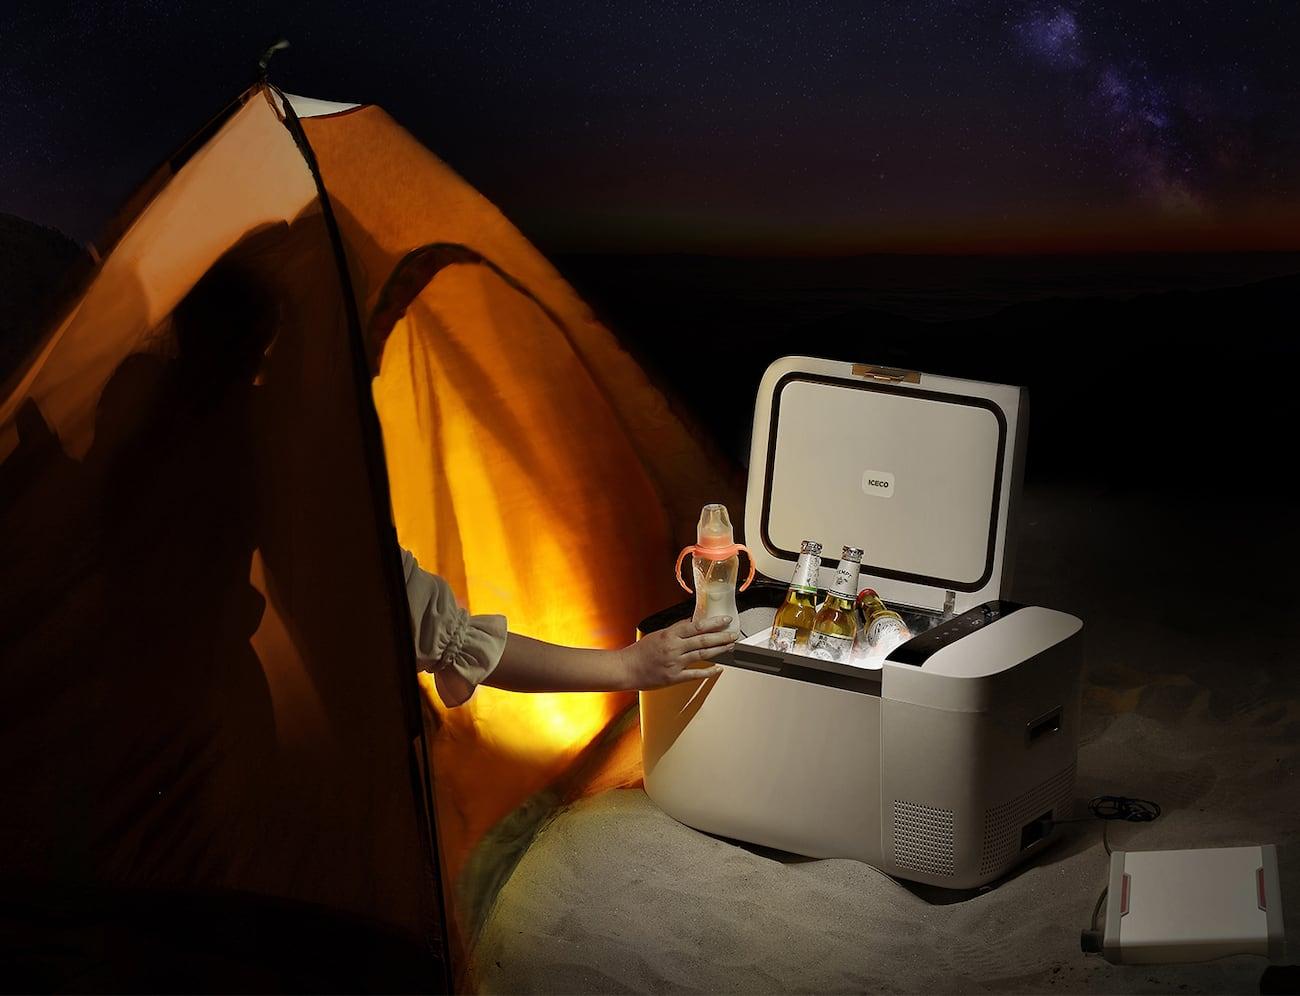 iFreezer Portable Smart Freezer